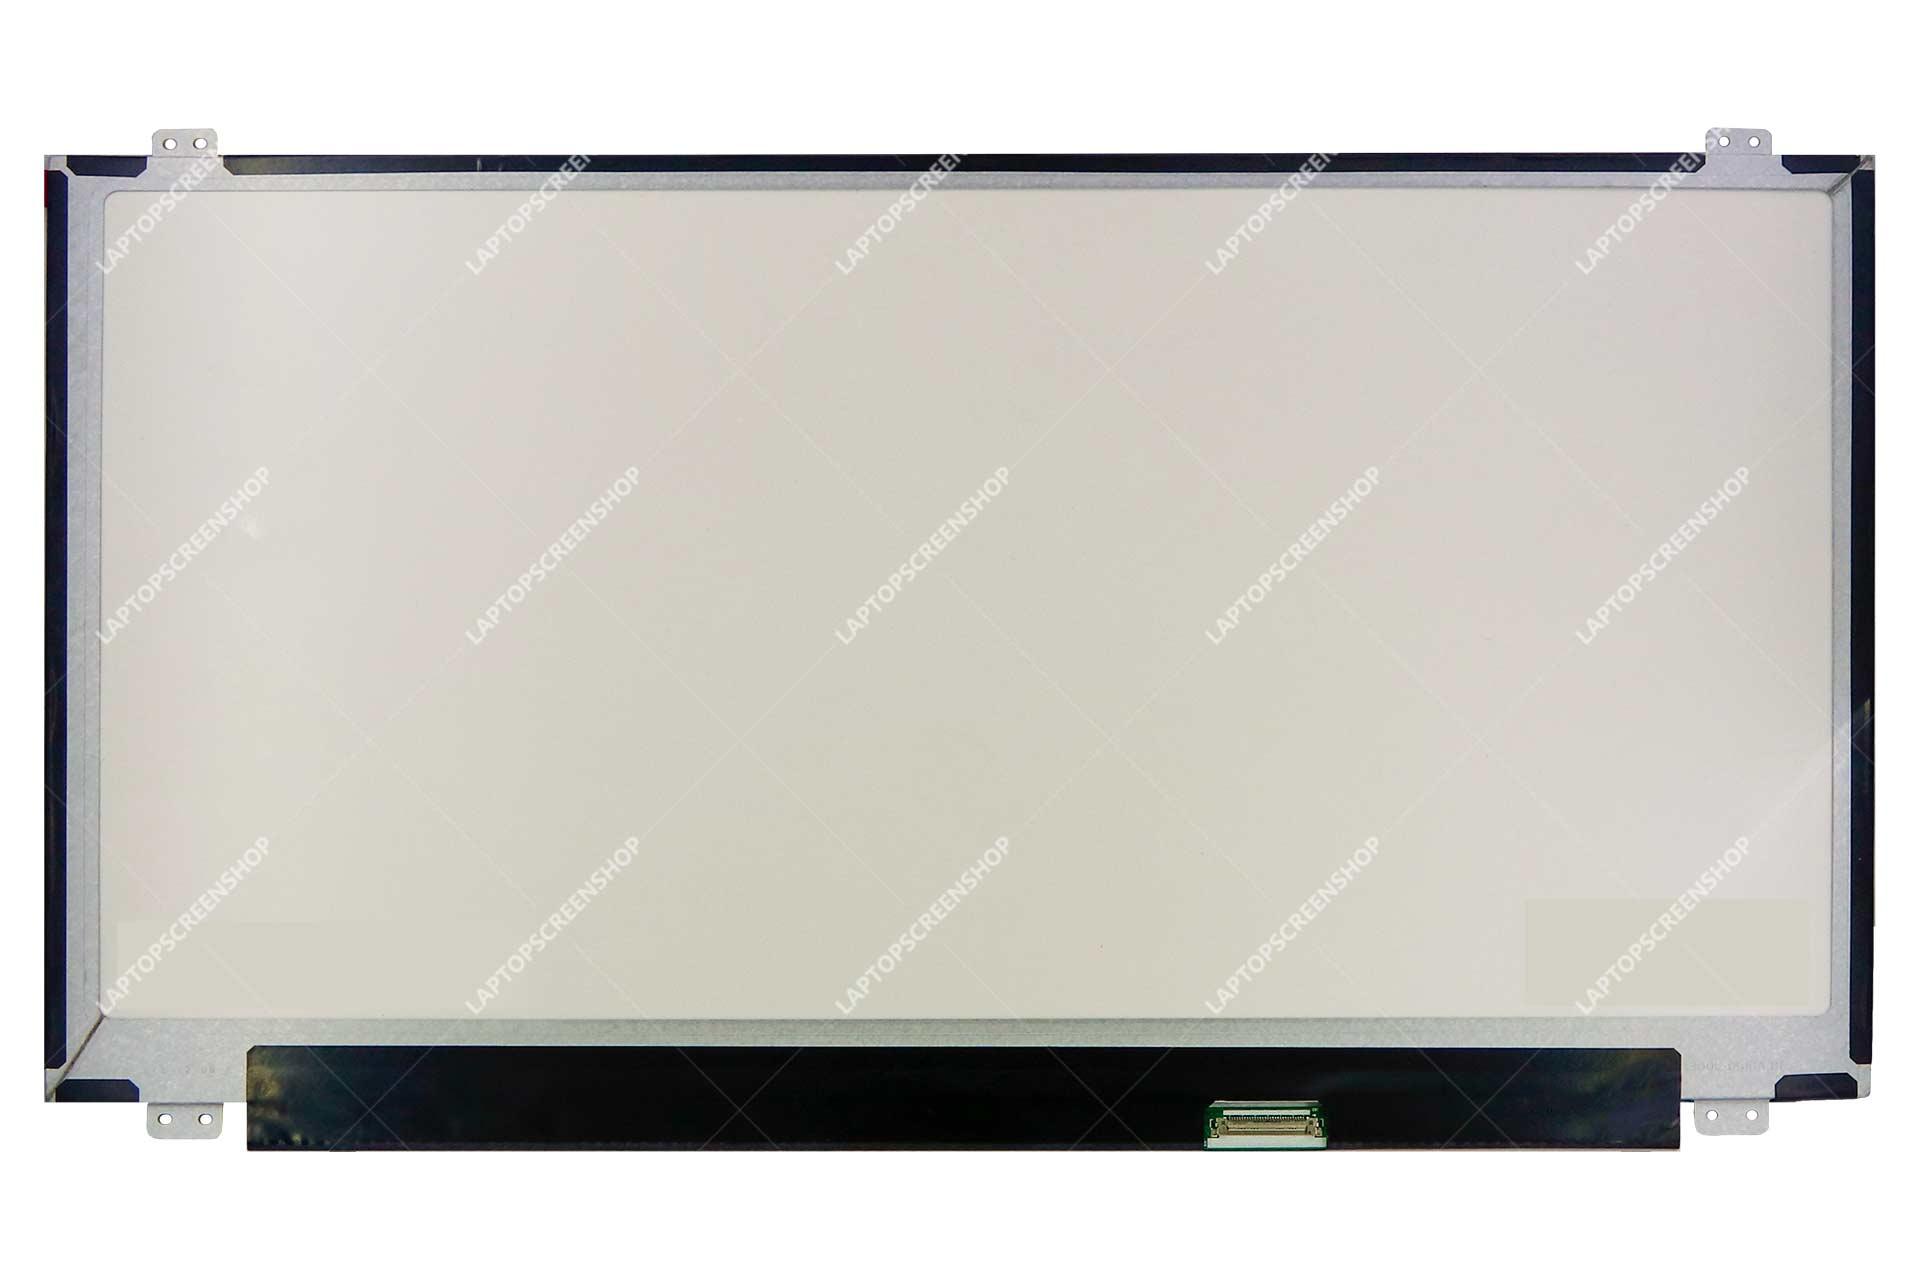 ACER-ASPIRE-E1-532-4870-LCD |HD|فروشگاه لپ تاپ اسکرين | تعمير لپ تاپ